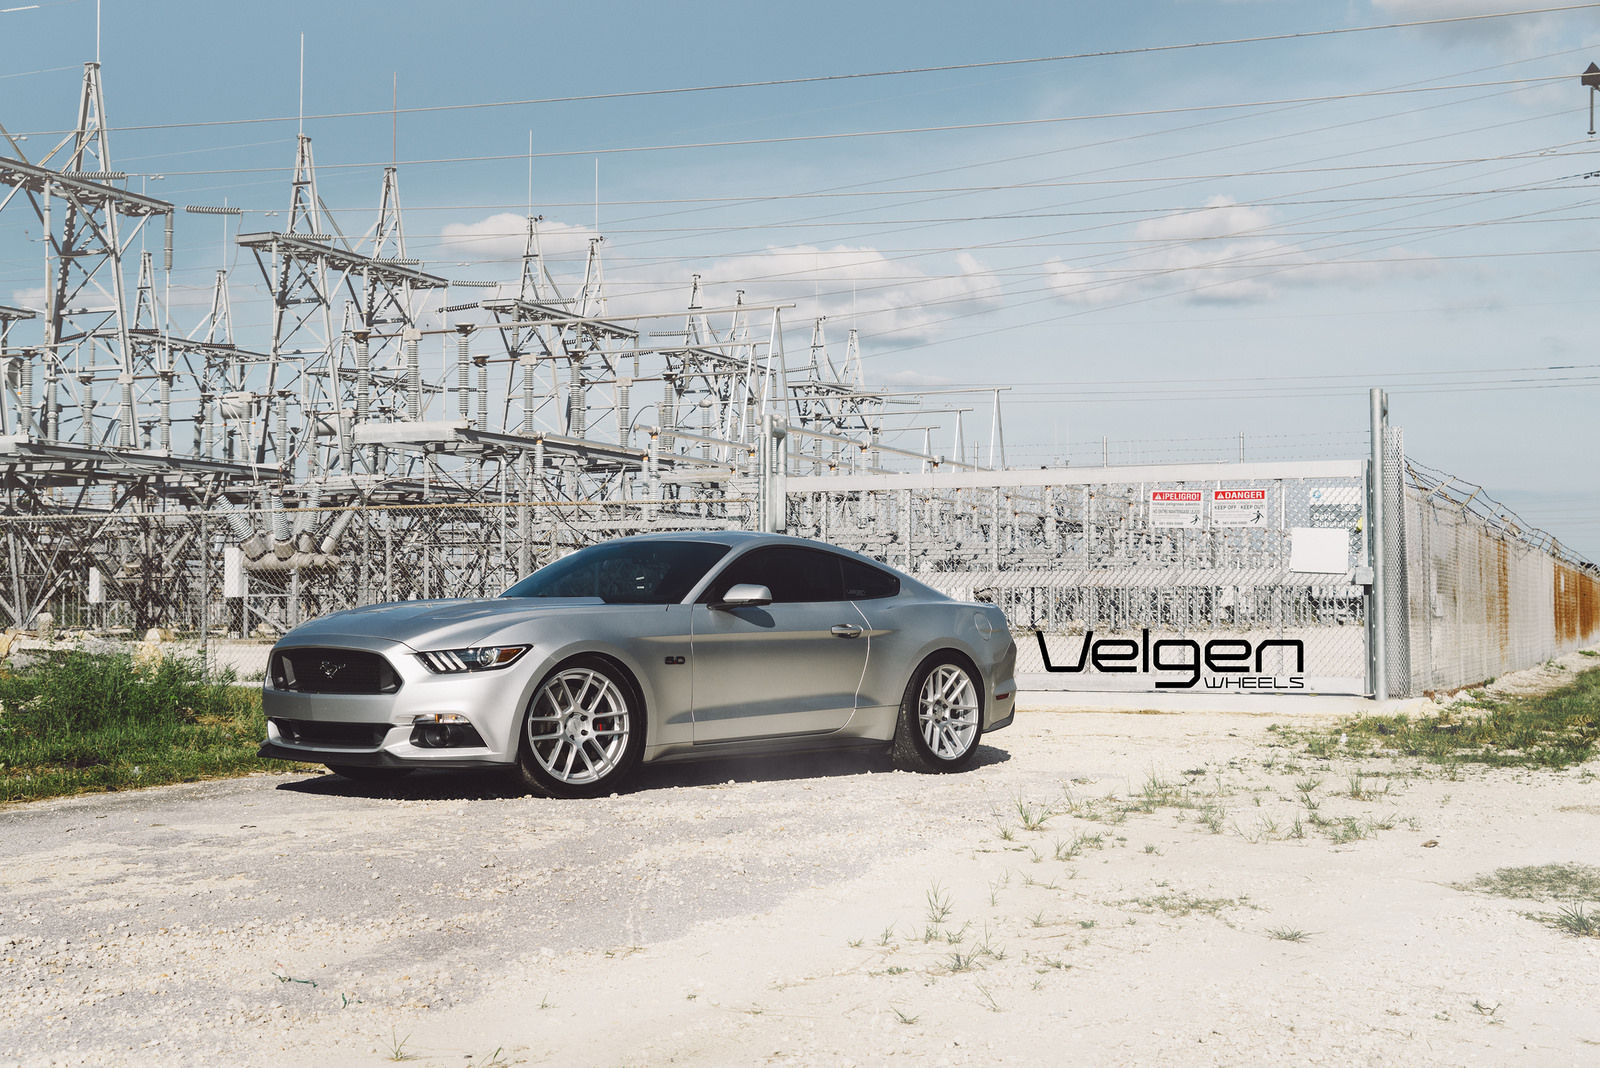 2015 Ford Mustang | 2015 Ingot Silver Mustang GT on Velgen Wheels VMB6 - Side Angled Shot